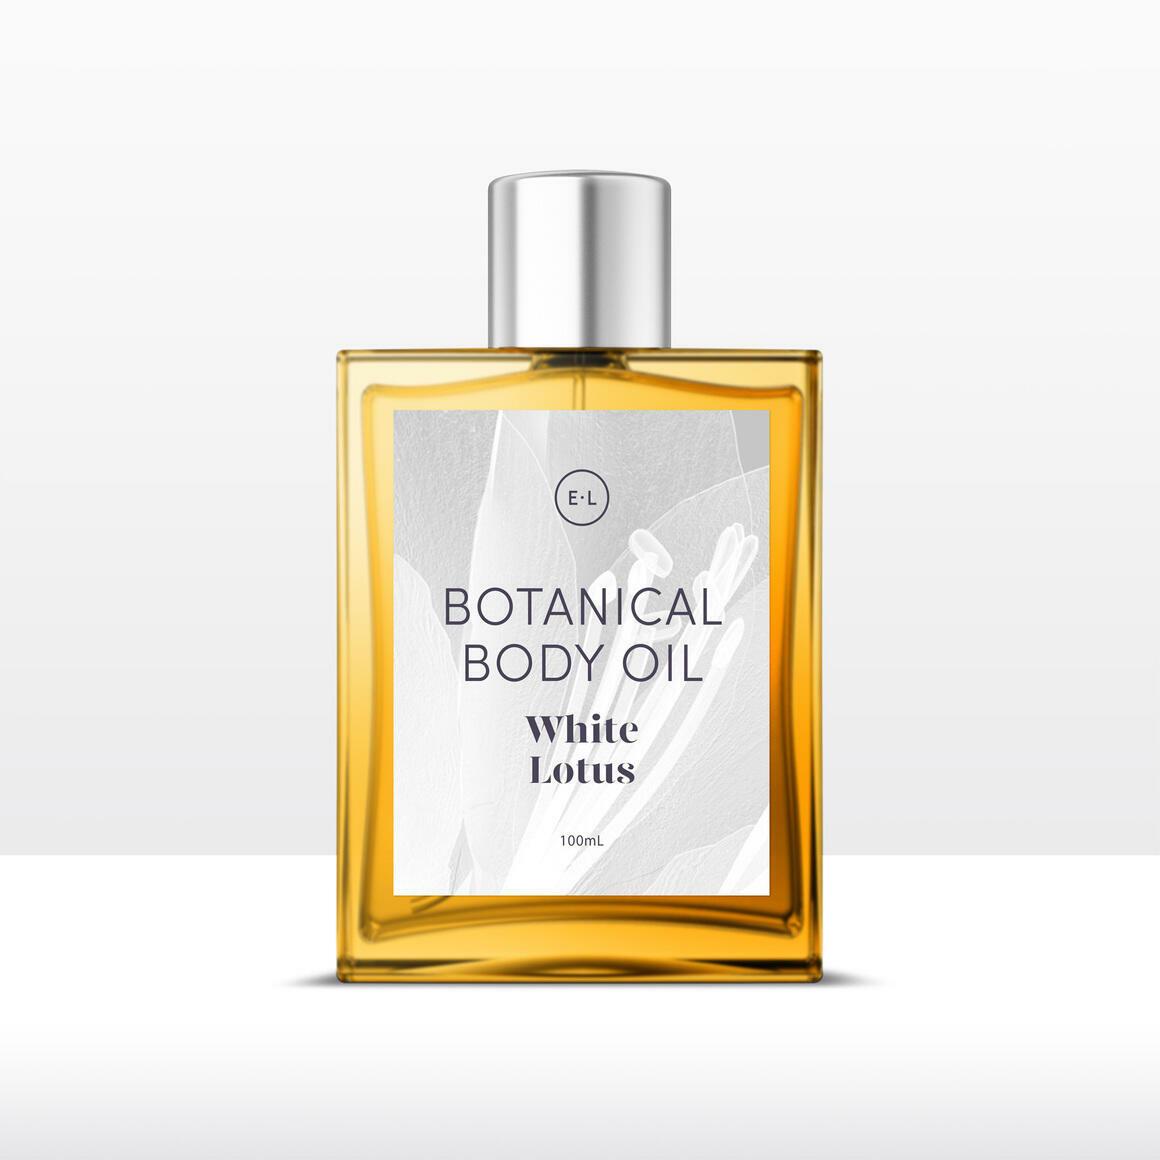 White lotus botanical body oil | Trada Marketplace